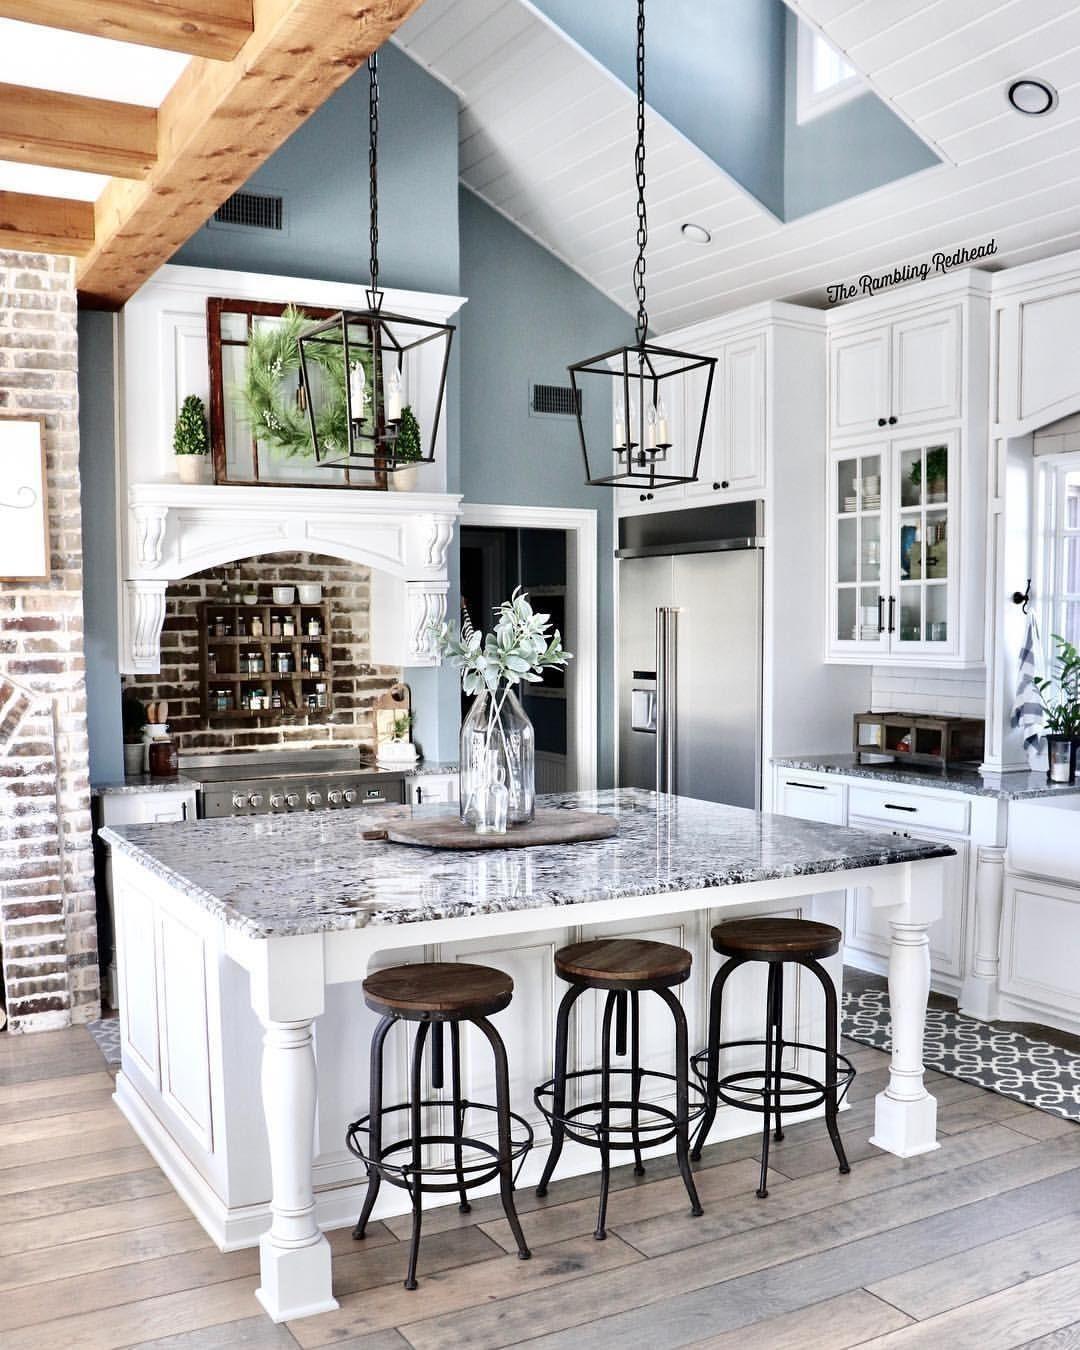 44 inspiring bohemian style kitchen decor ideas zyhomy bohemian style kitchen home decor on boho chic decor living room bohemian kitchen id=21800